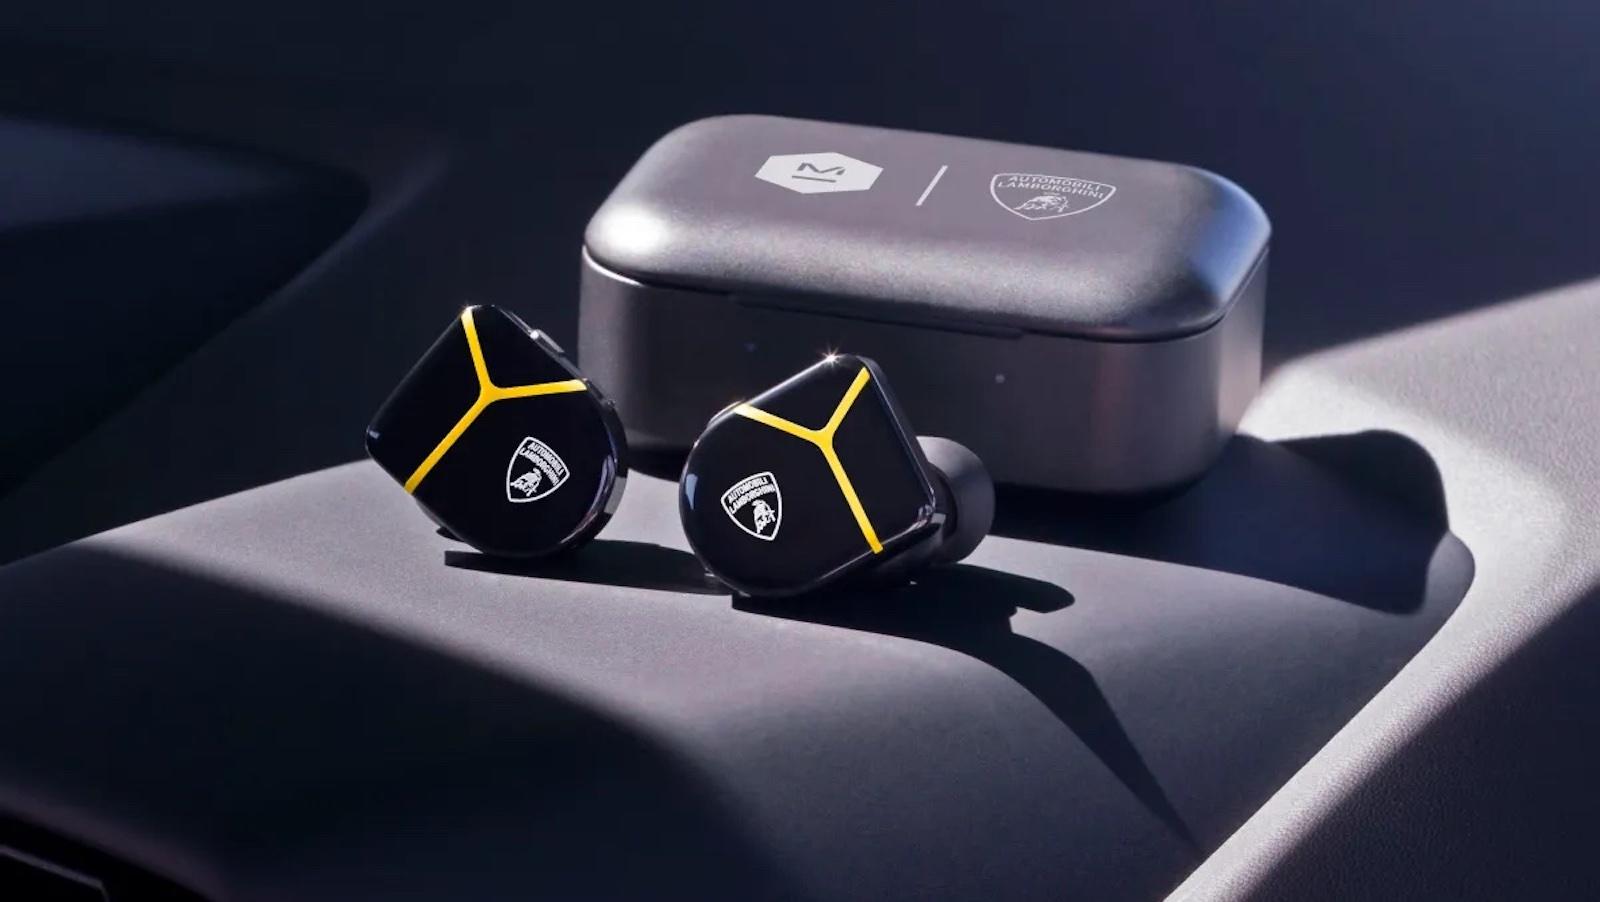 Master & Dynamic x Lamborghini MW07 Plus earbuds have an iconic sports car design